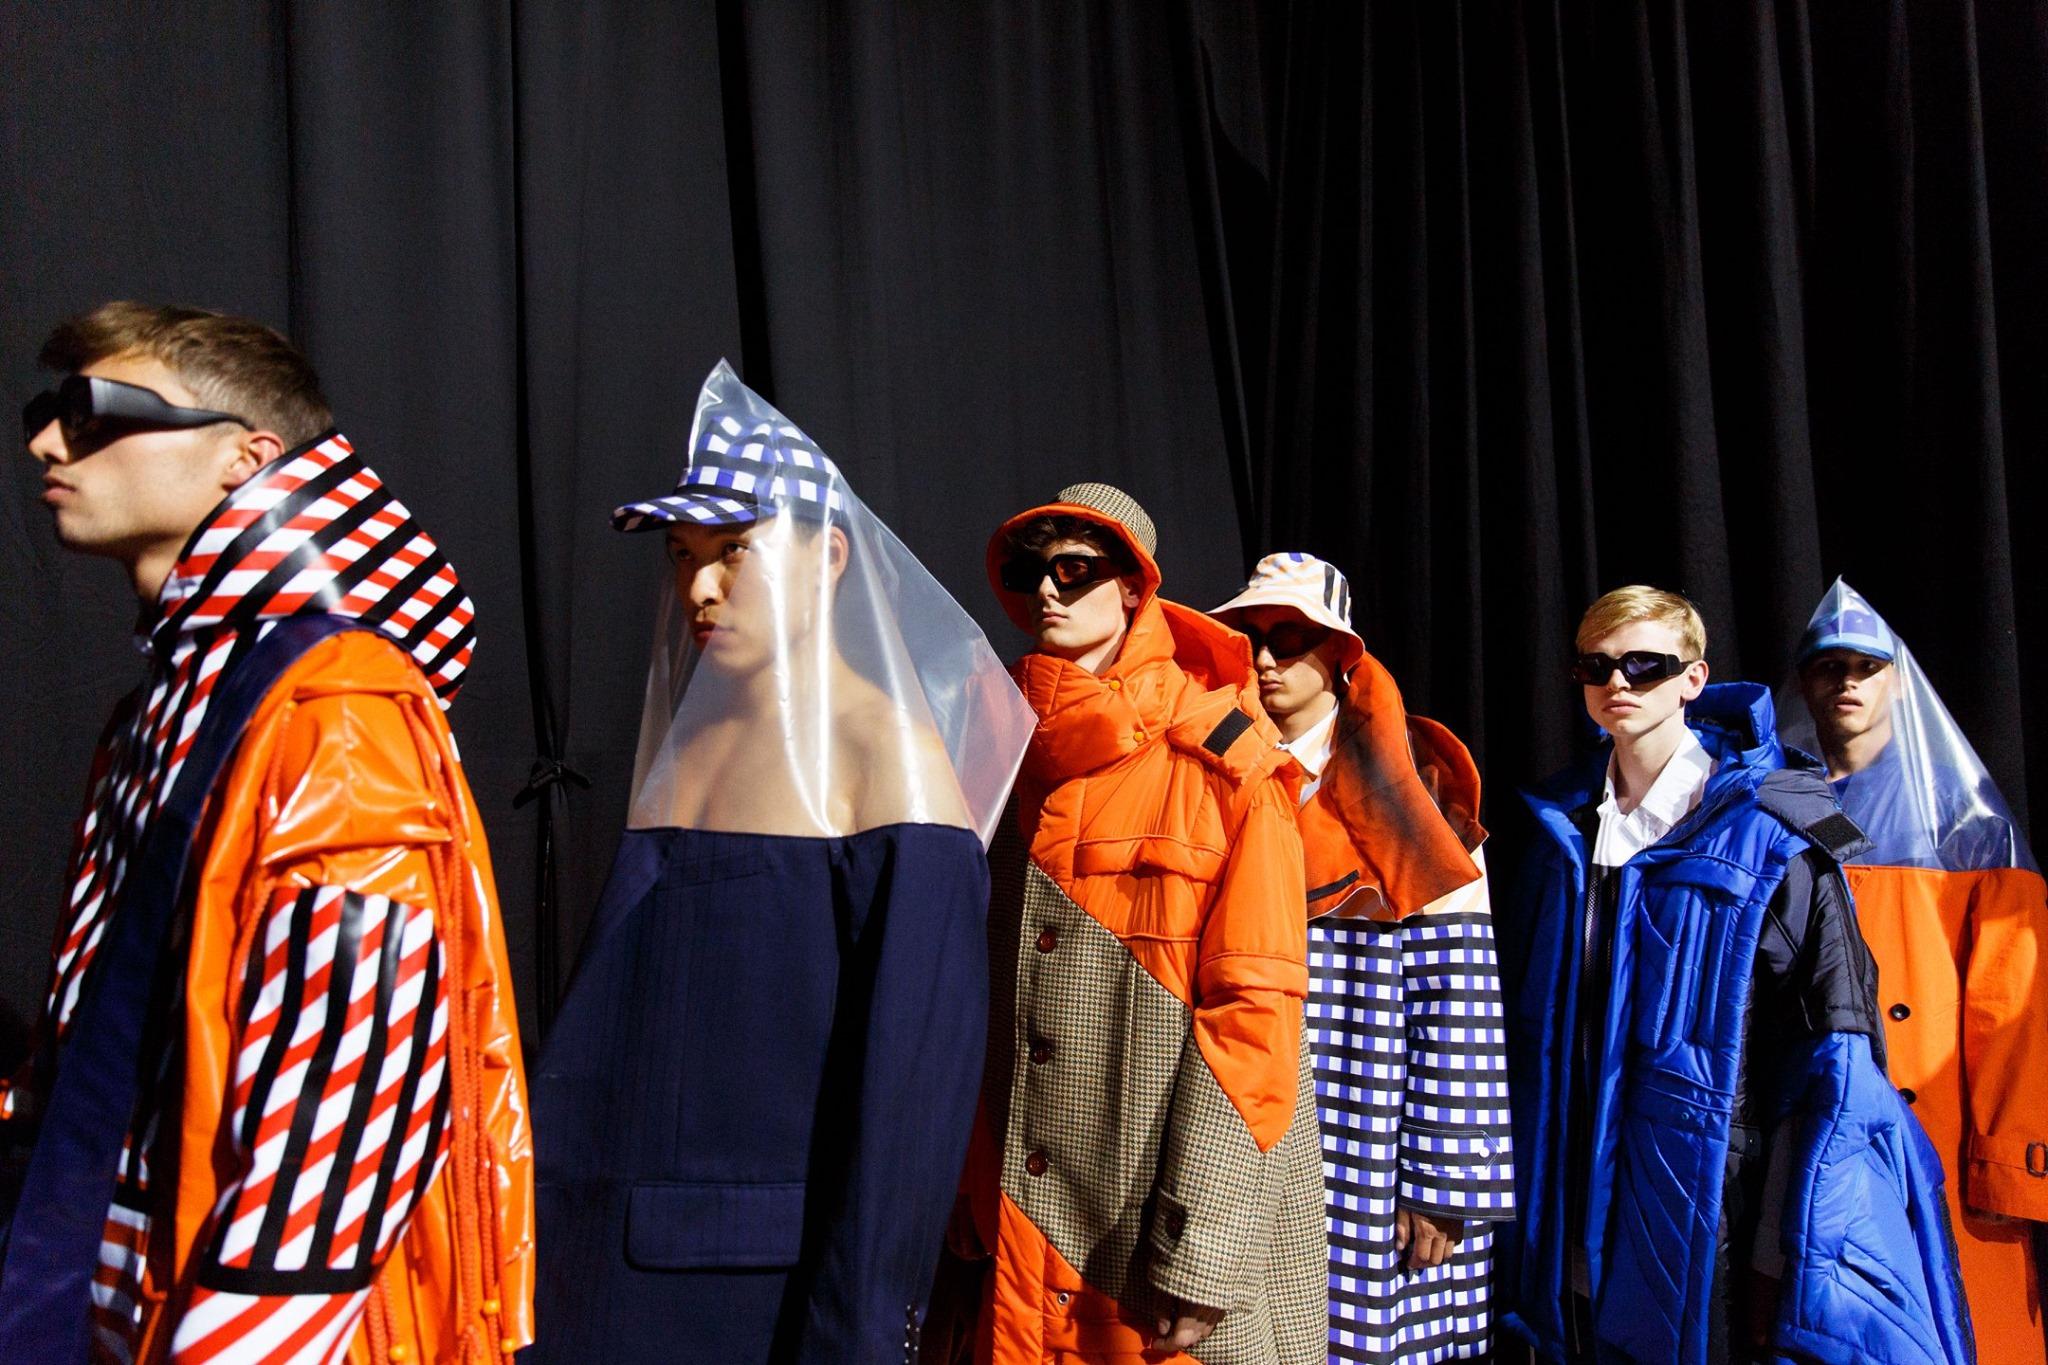 Master Nick Haemels / (c) Maarten De Laet for Antwerp Fashion Department